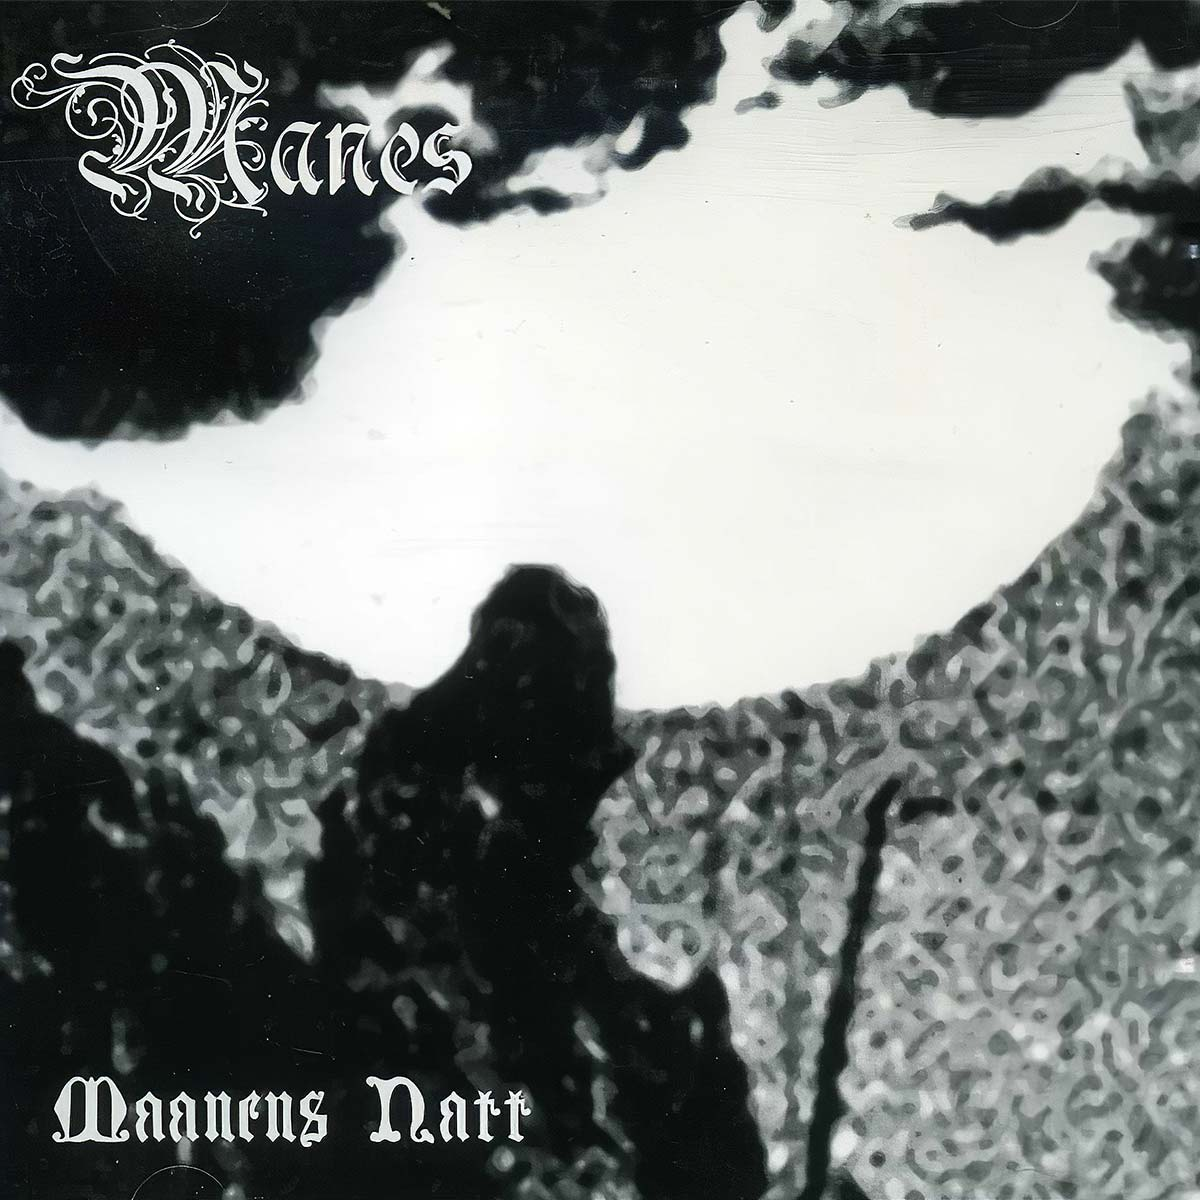 Manes - Maanens Natt (cover)